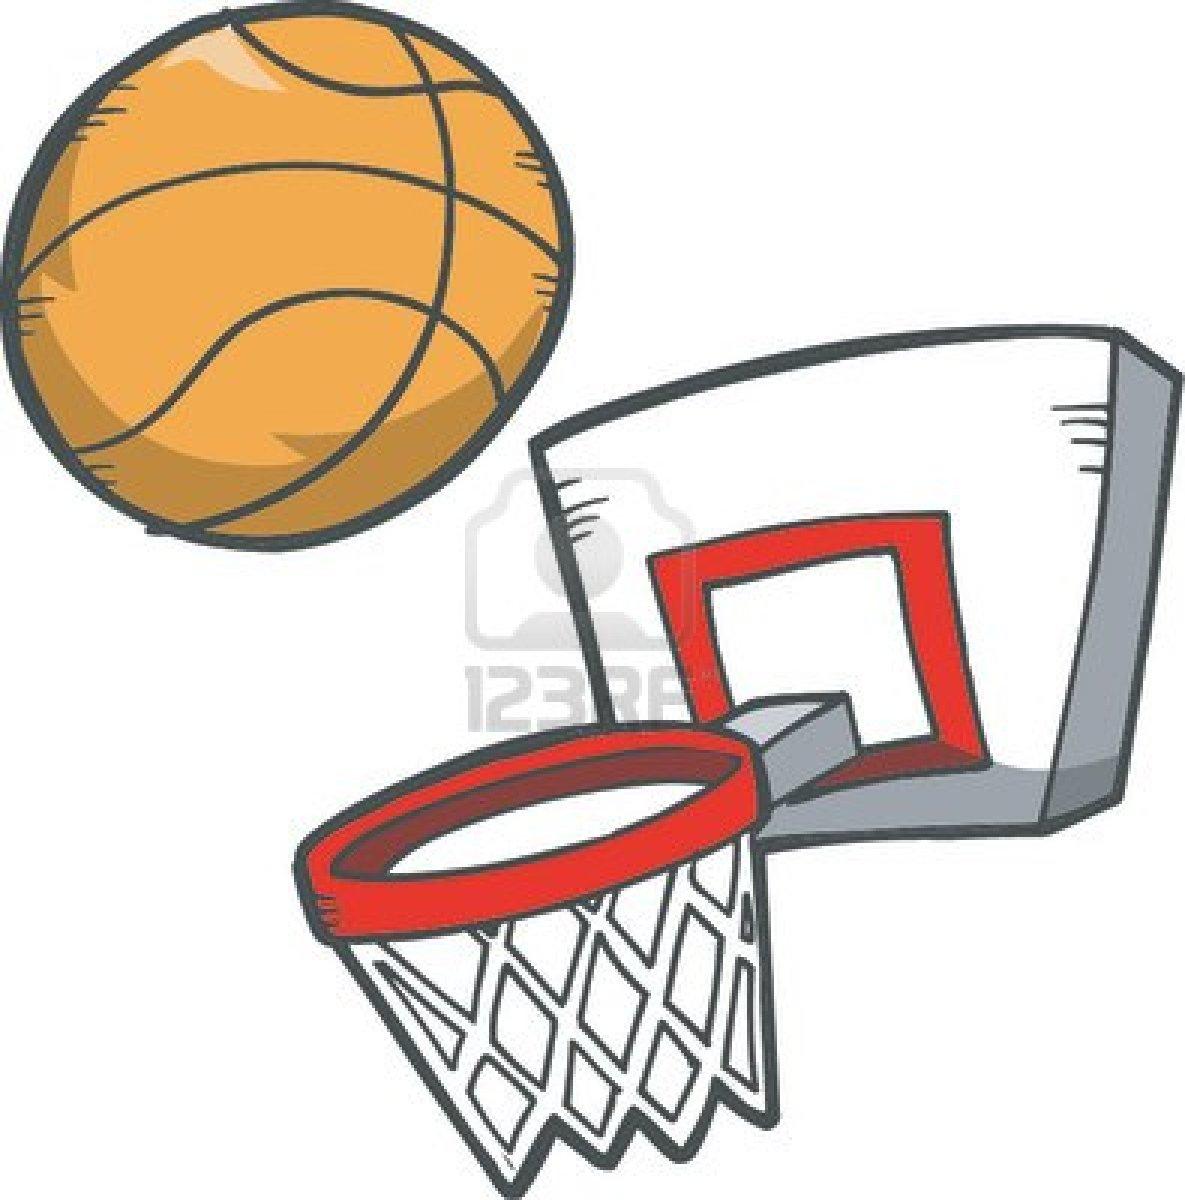 Ball clipart cartoon basketball Clipart Board board Basketball Png